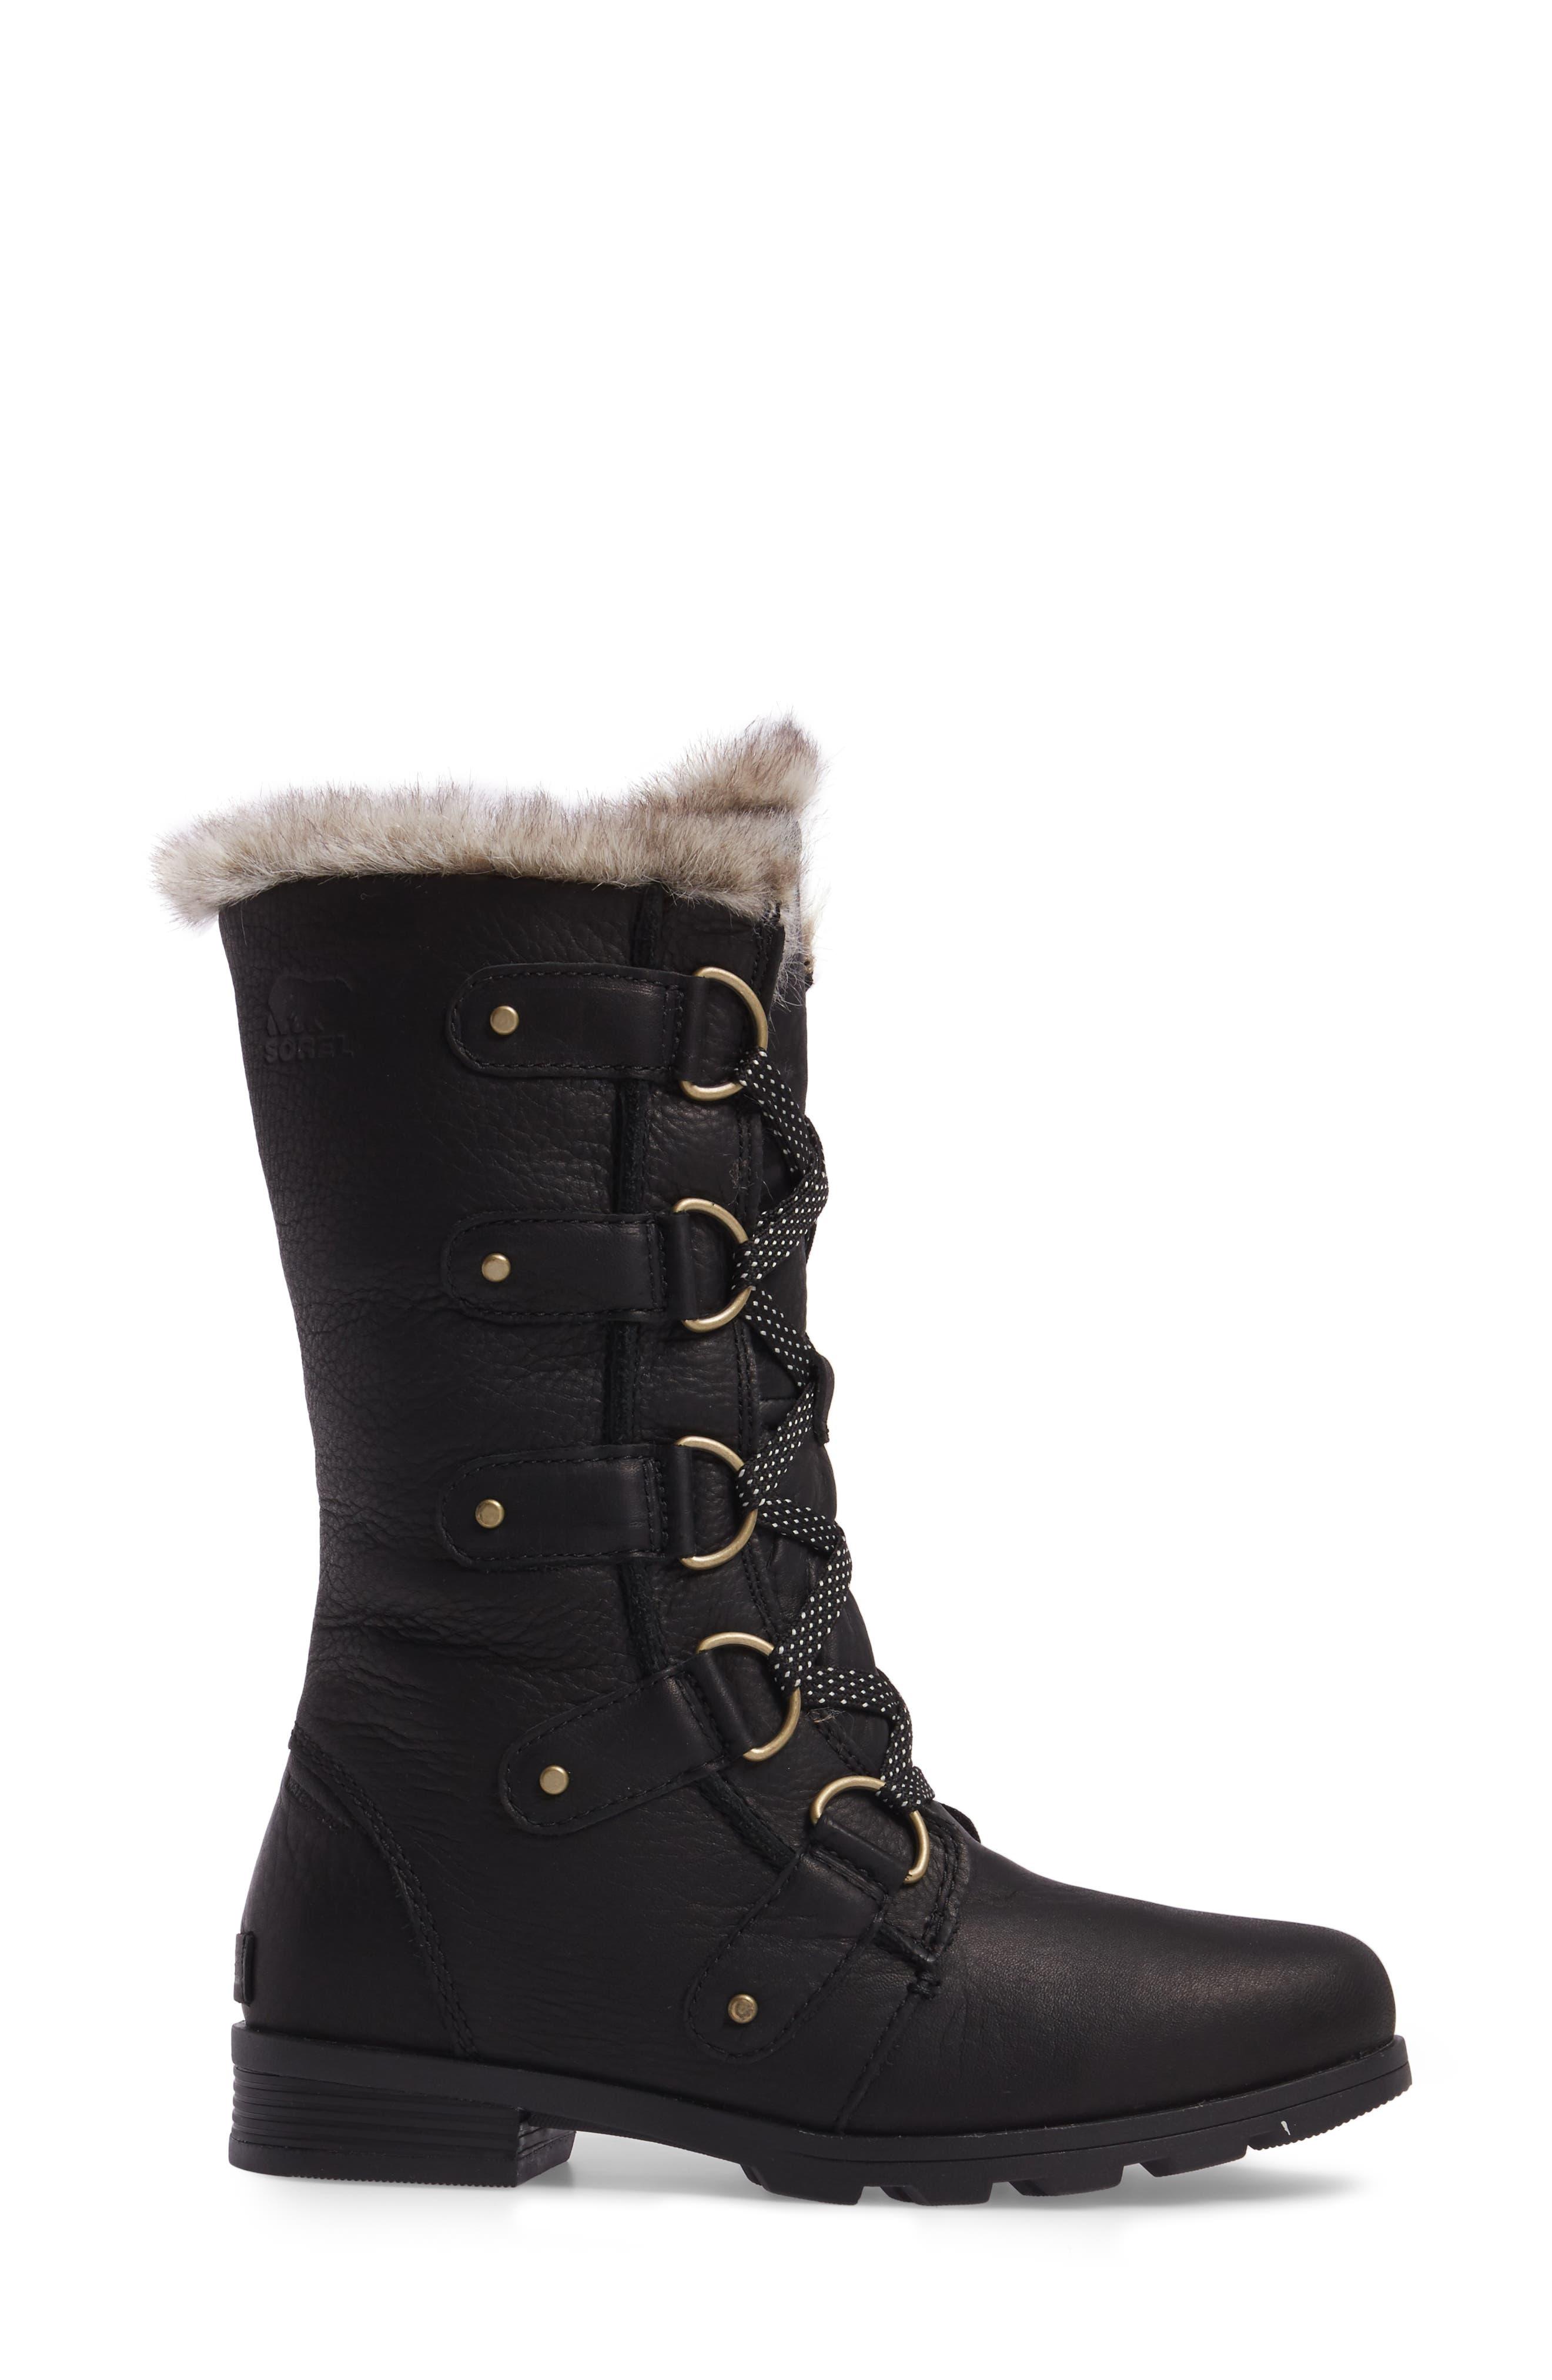 Emelie Waterproof Lace Up Boot with Faux Fur Trim,                             Alternate thumbnail 3, color,                             010